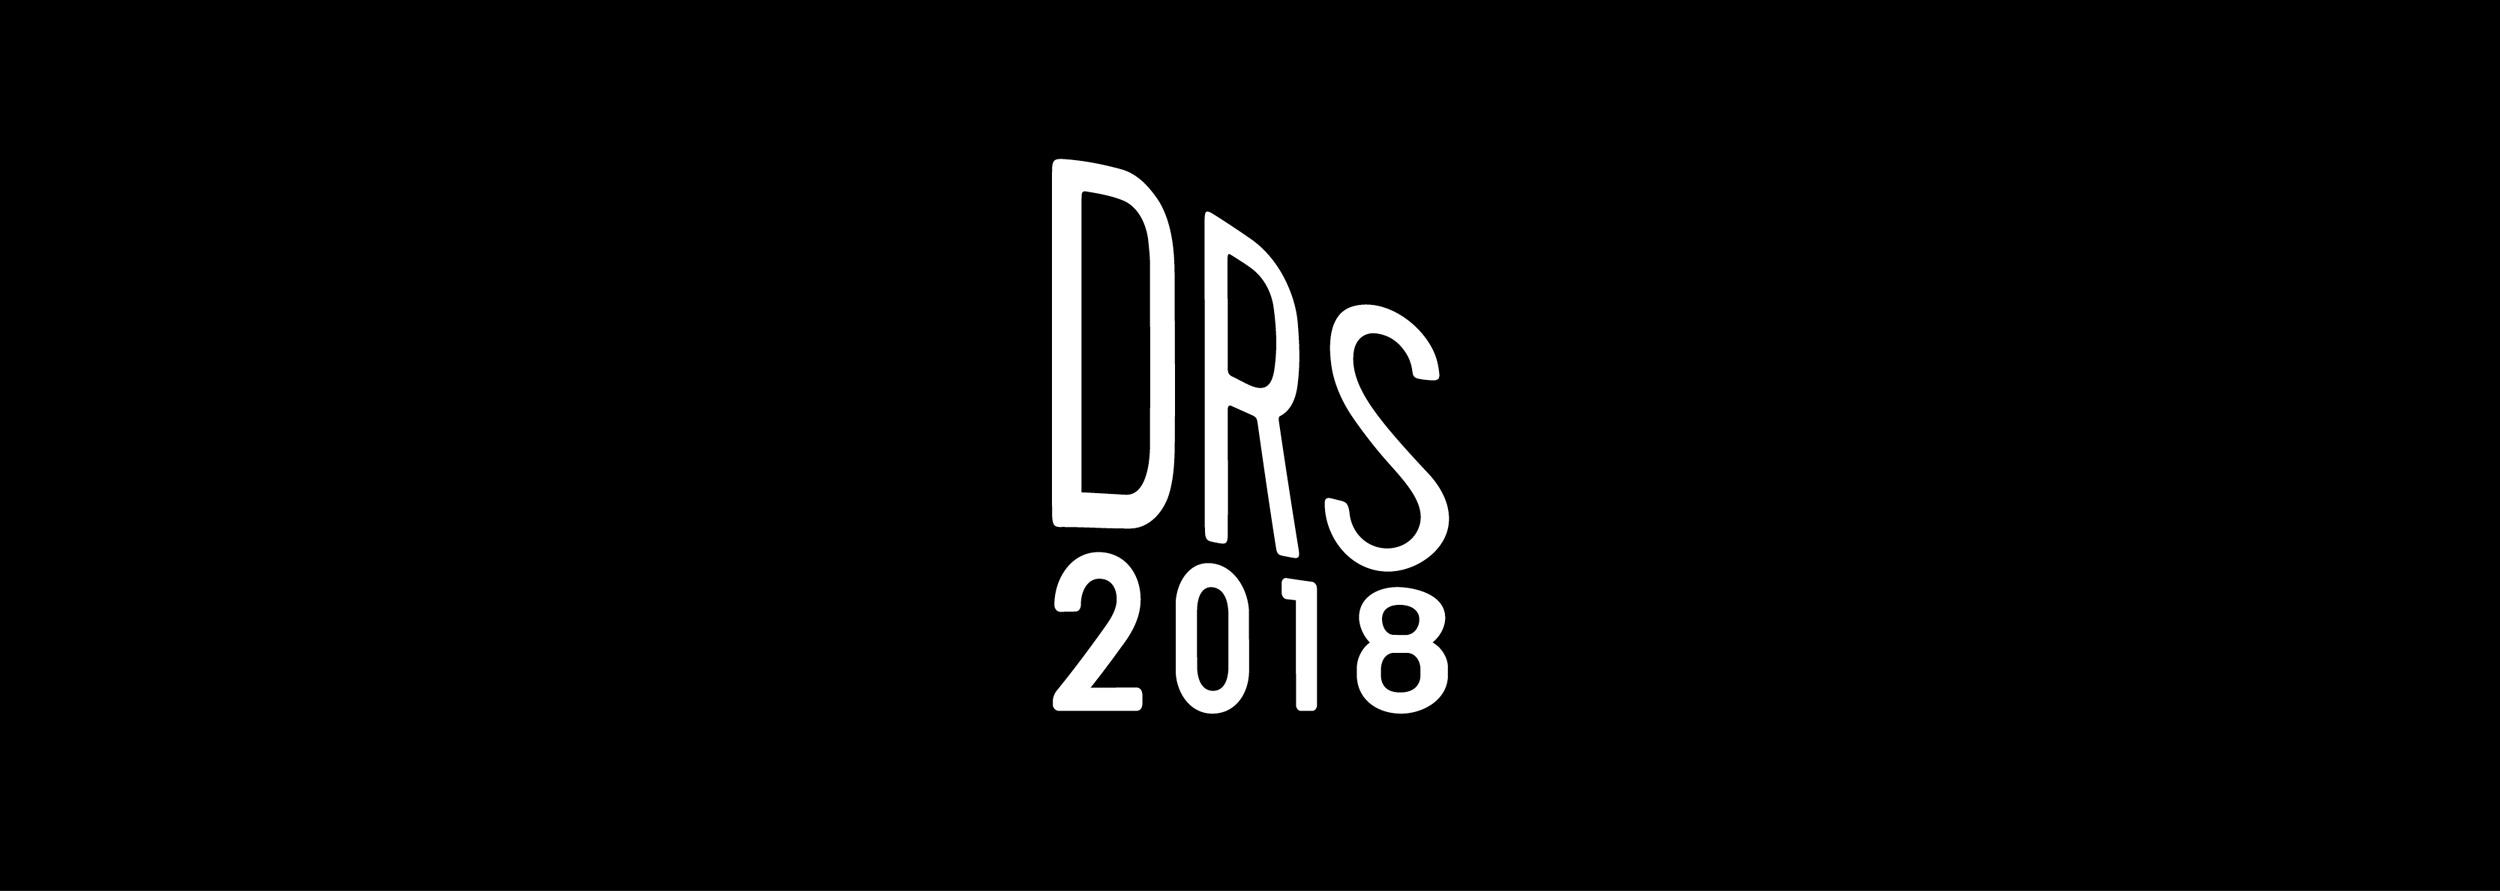 DRS2018 Brand Design Brand Development